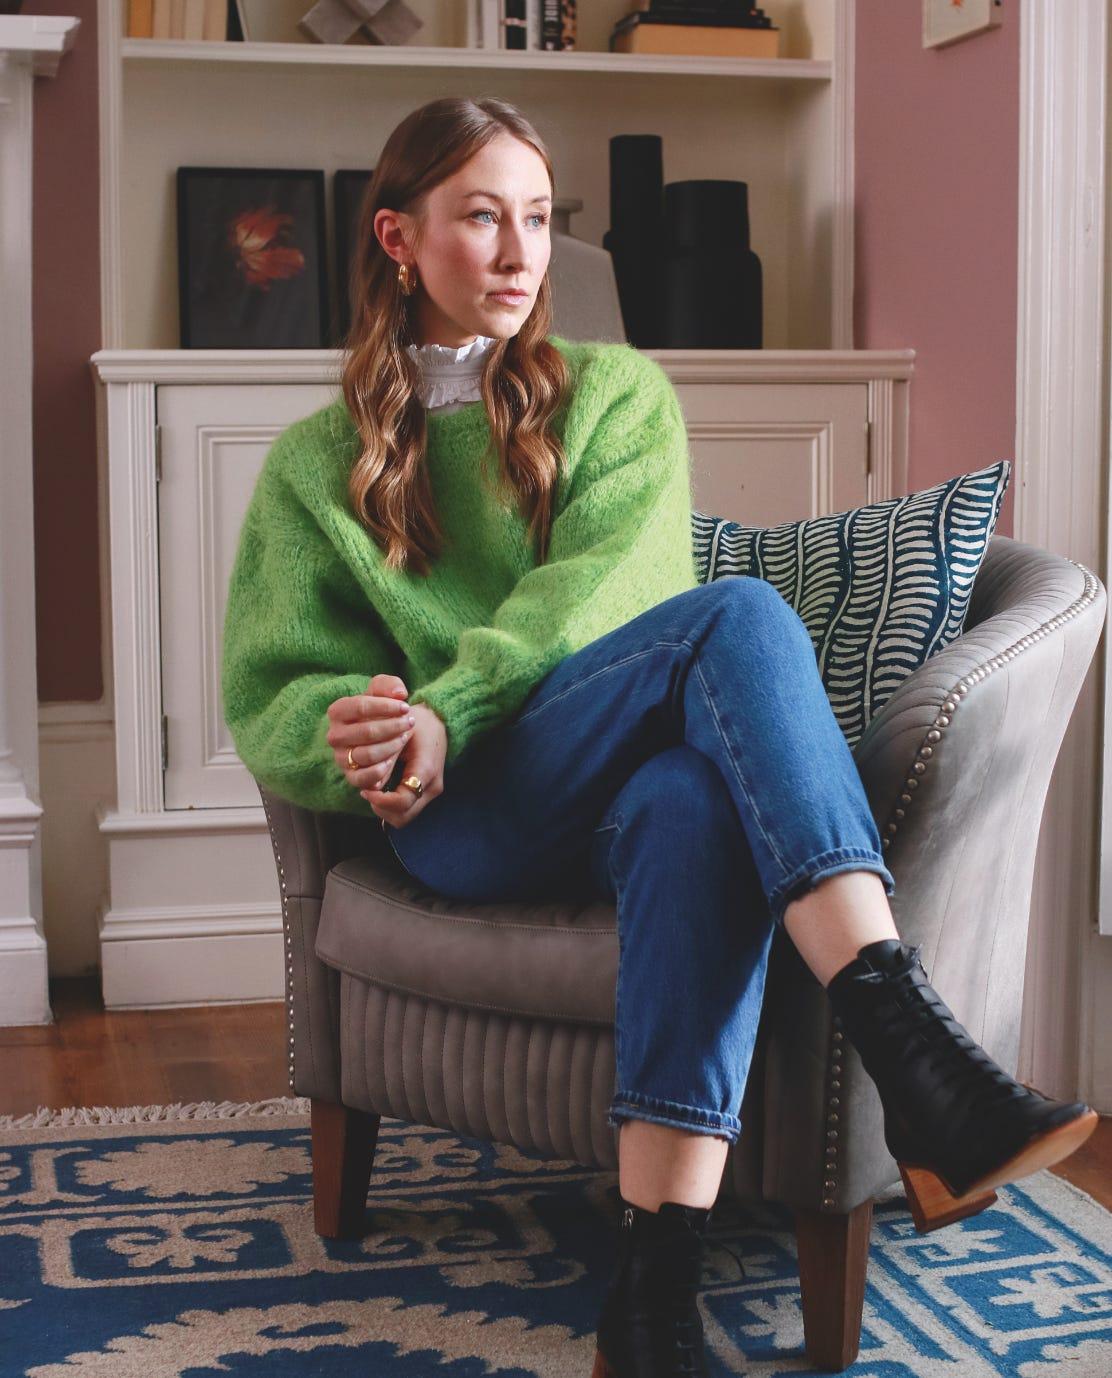 Erin Doherty wearing a green jumper, sitting in an Ash Grey Crosby armchair